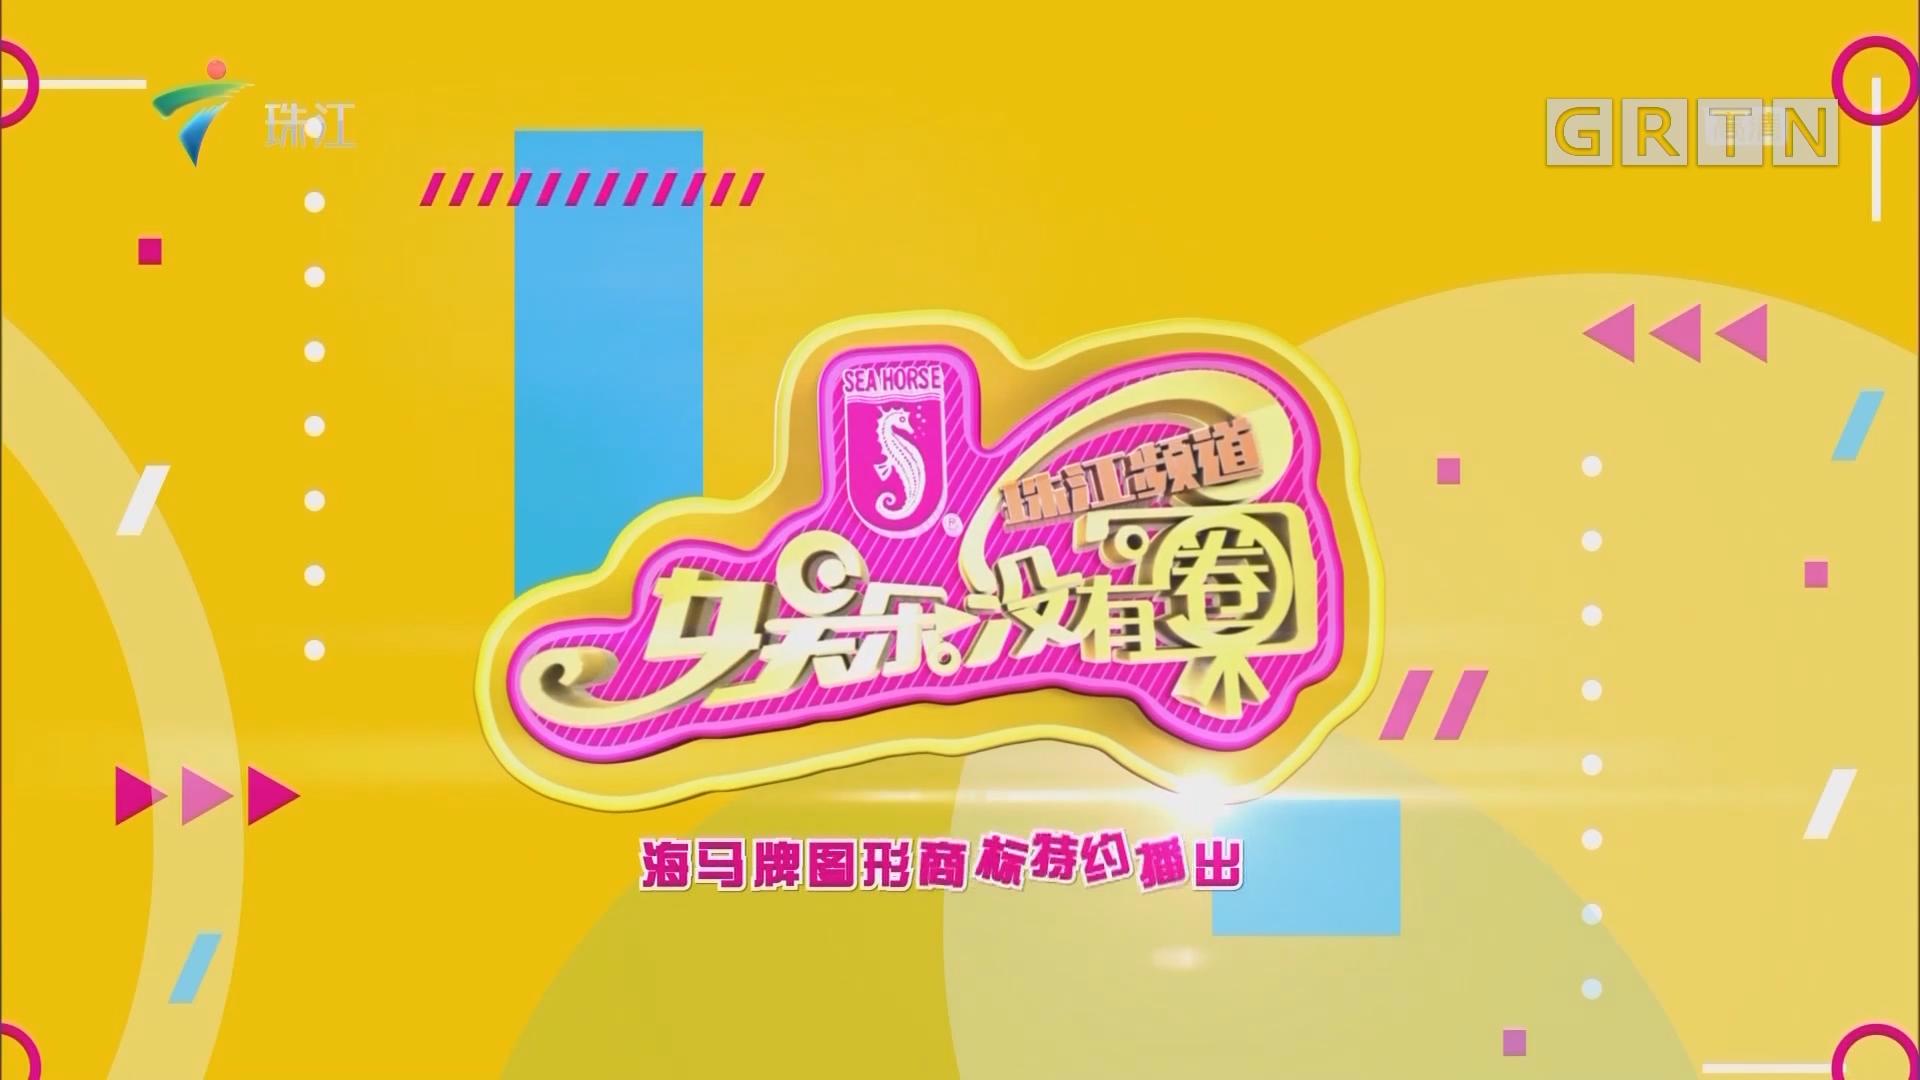 [HD][2018-12-06]娱乐没有圈:刘亦菲:宁做平民不当公主! 神仙姐姐求生欲比你还强?